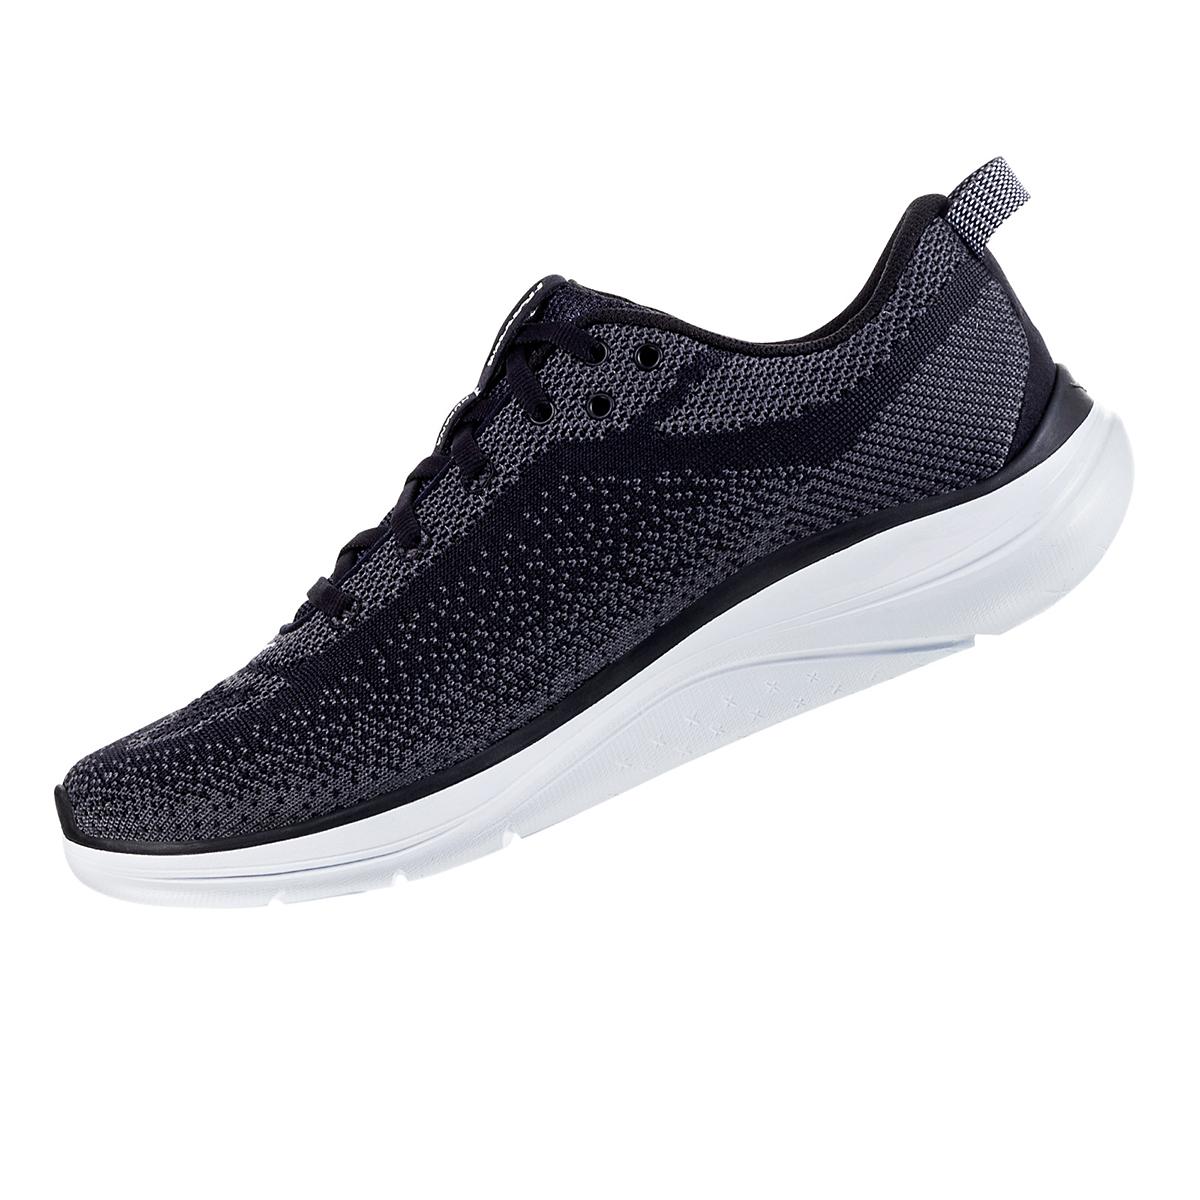 Women's Hoka One One Hupana Flow Running Shoe - Color: Black/ Dark Shadow - Size: 5 - Width: Wide, Black/ Dark Shadow, large, image 2